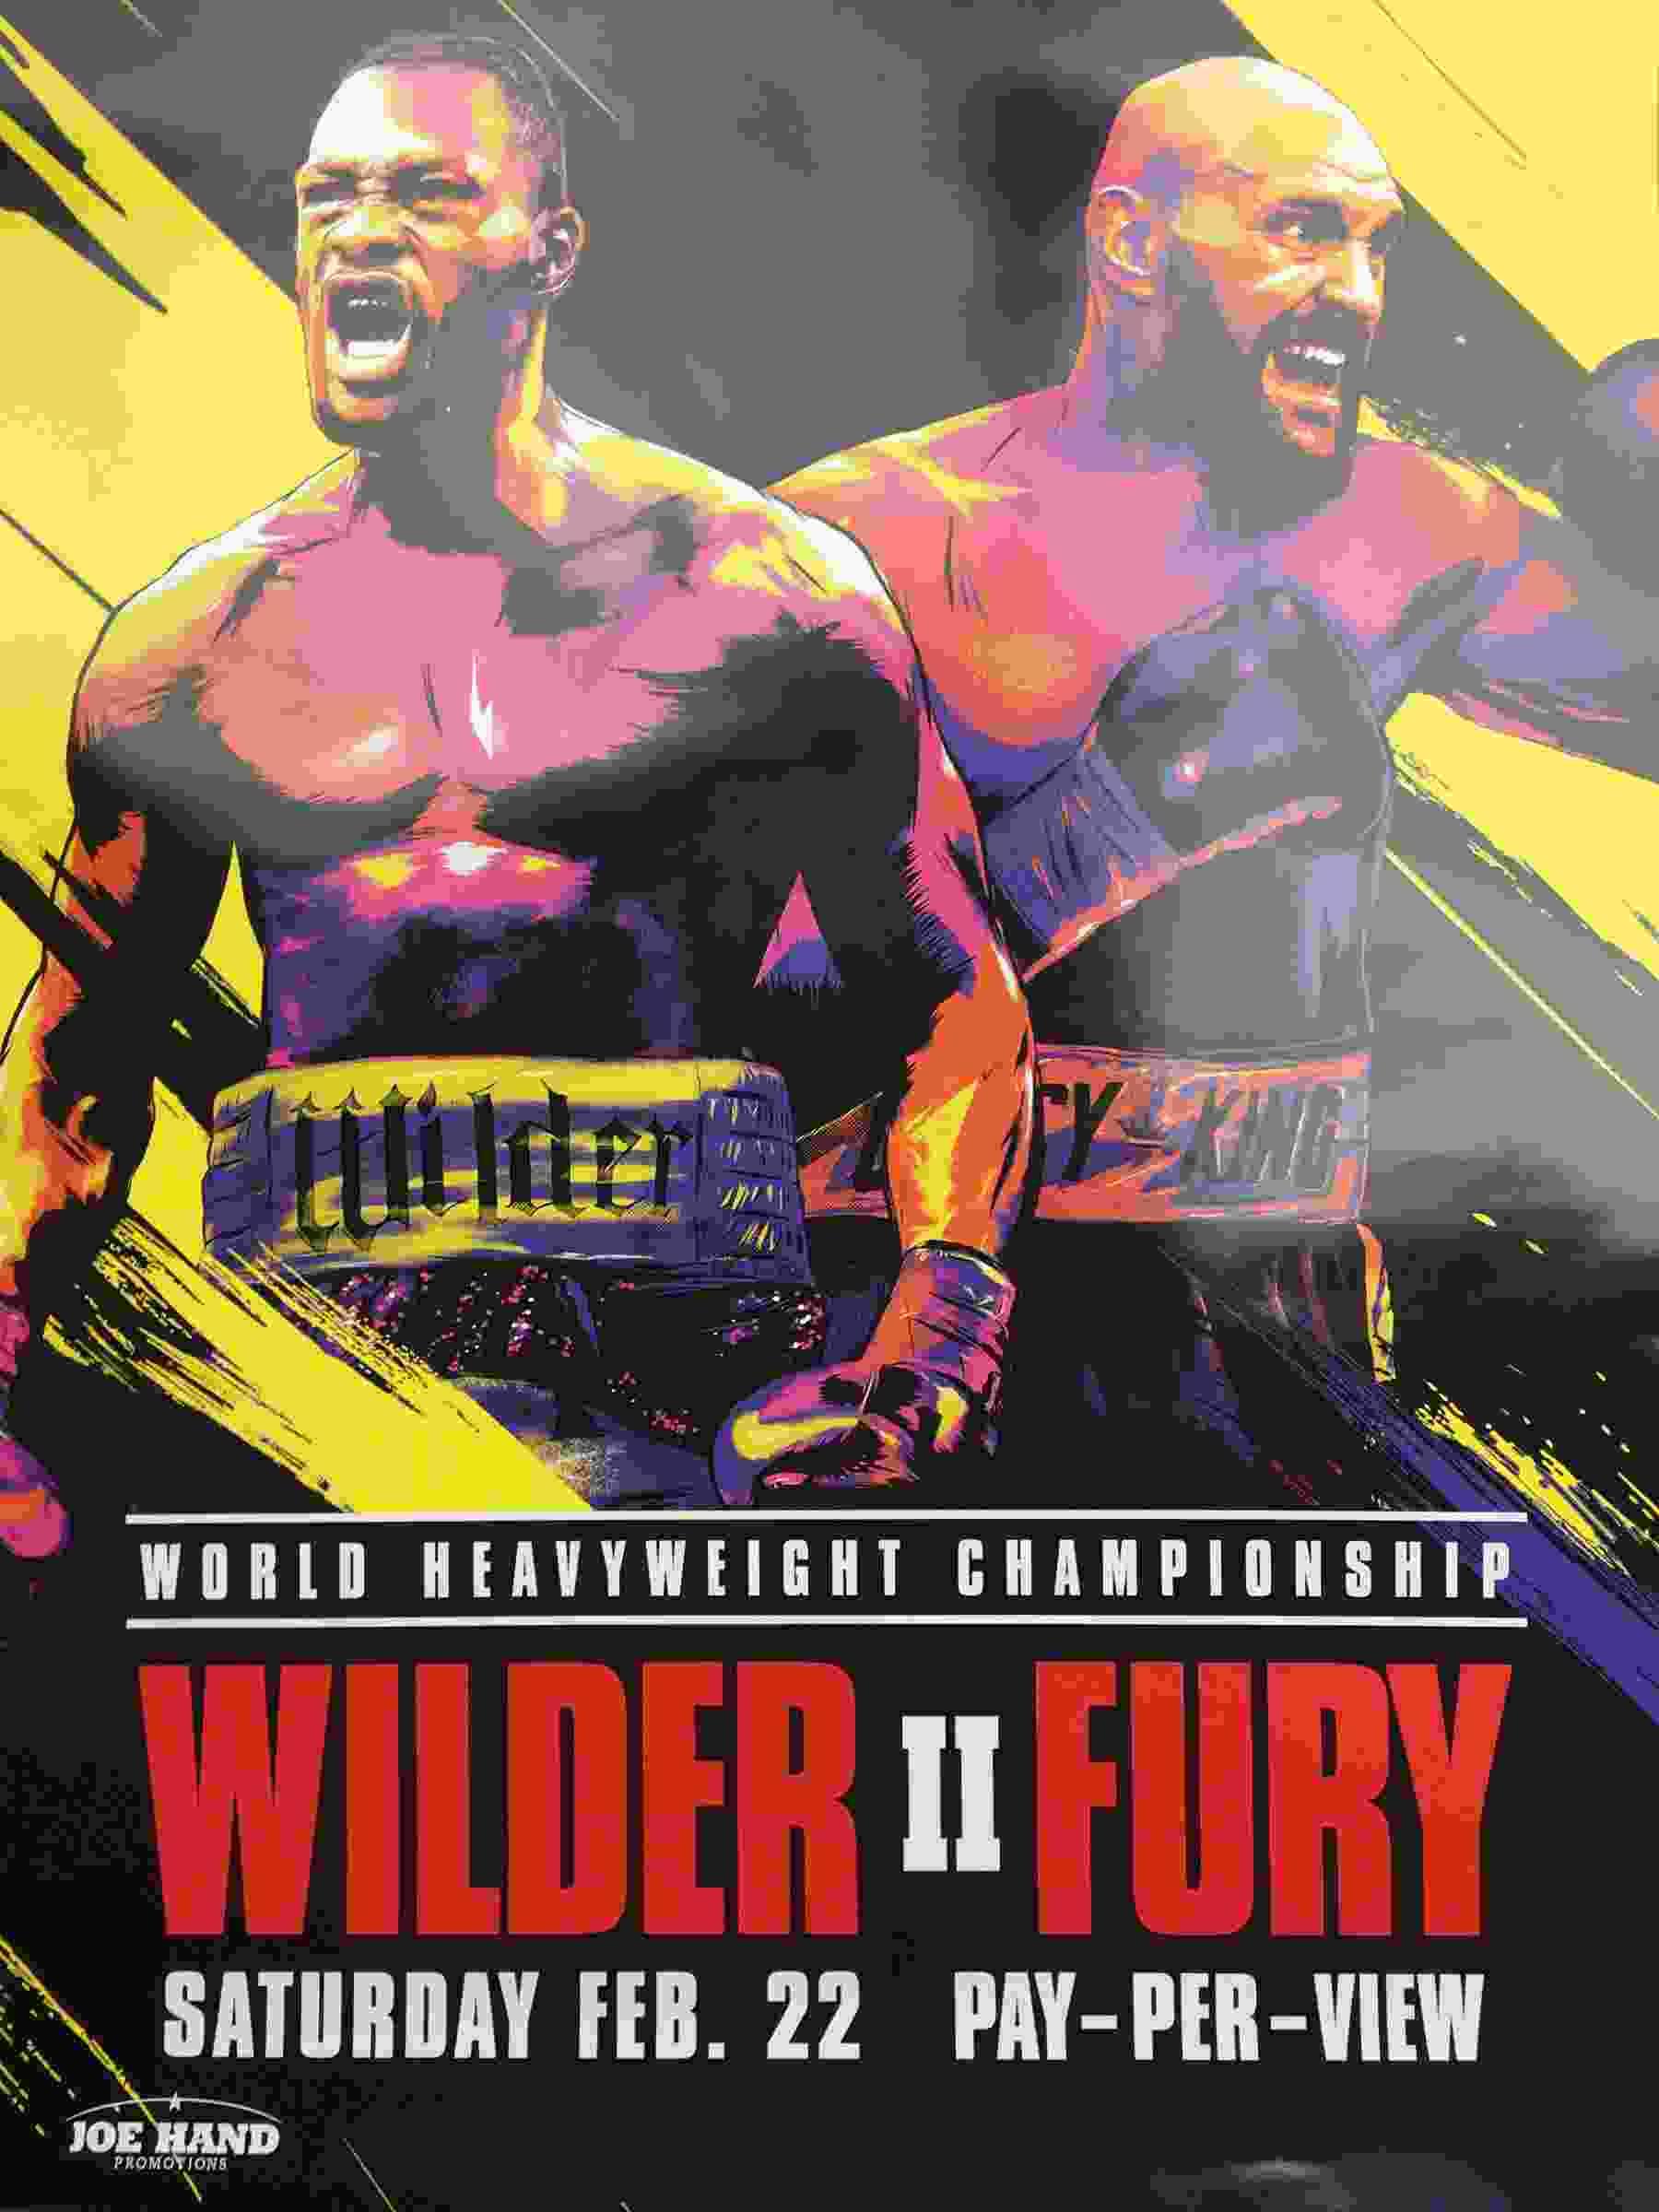 Fury vs Wilder 2 fight poster